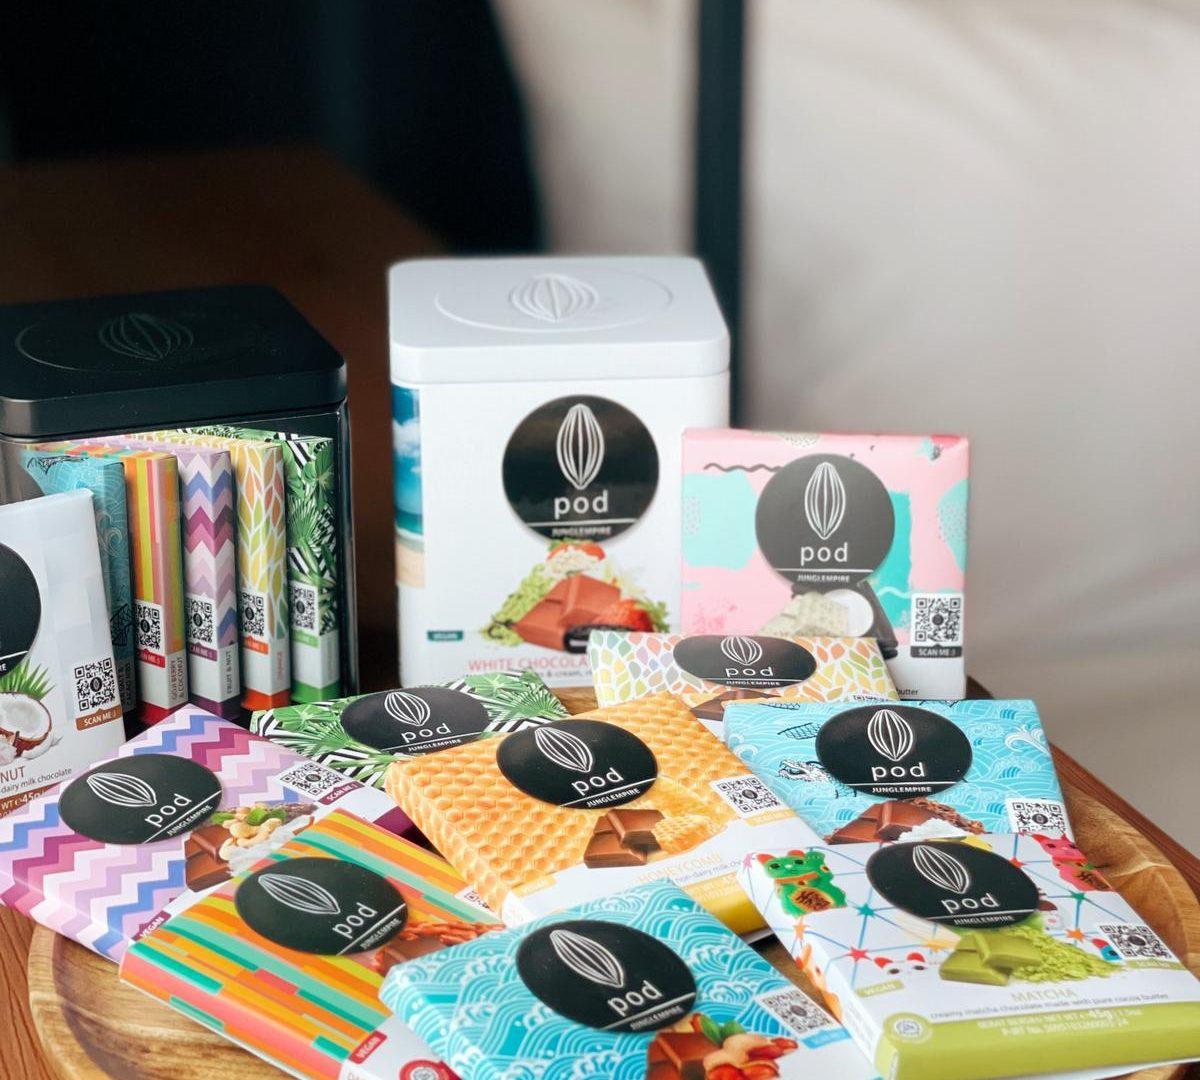 Pod Chocolate set for Easter Package Residence G Hong Kong